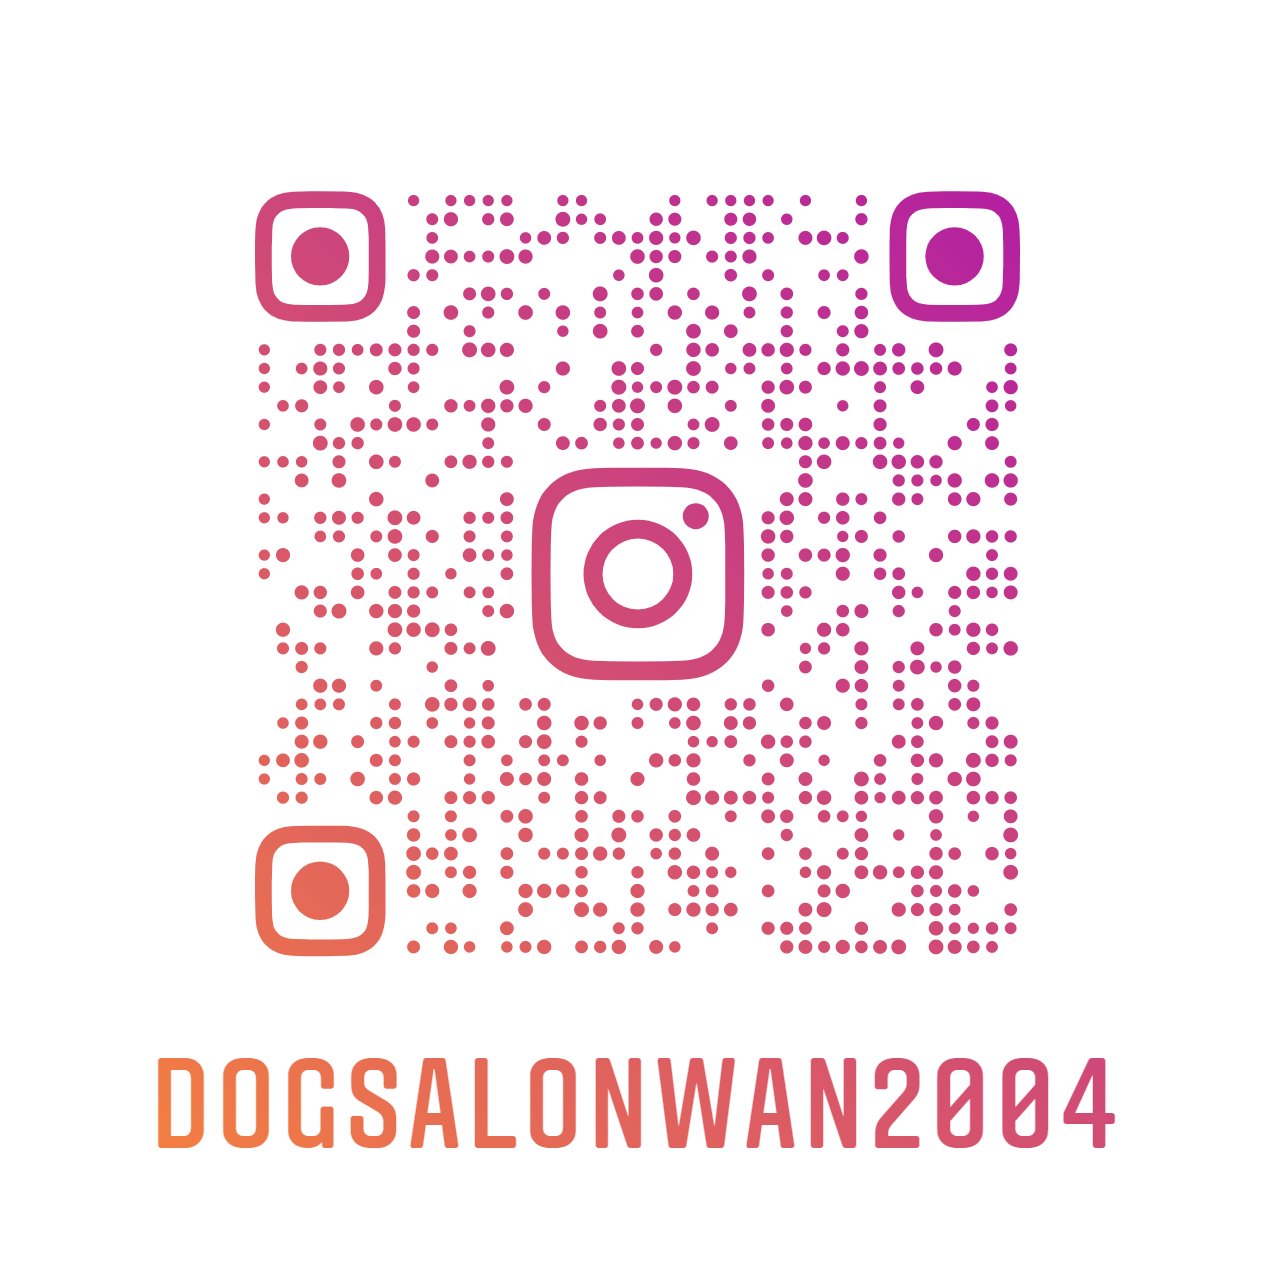 dogsalonwan2004_nametag_2021082913253586e.png